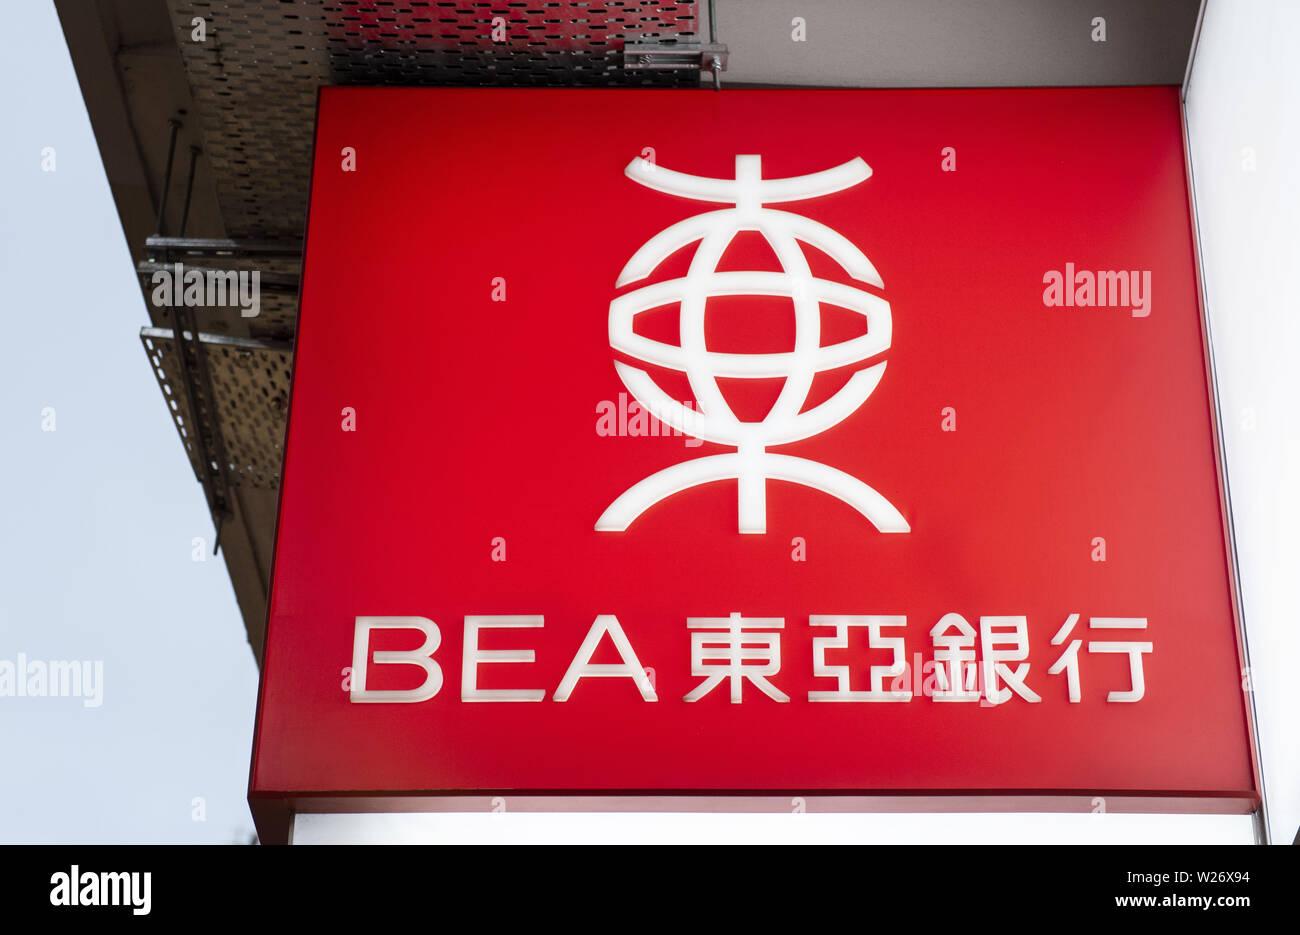 Hong Kong, China. 17th May, 2019. The Bank of East Asia (BEA) branch and logo seen in Hong Kong. Credit: Budrul Chukrut/SOPA Images/ZUMA Wire/Alamy Live News - Stock Image